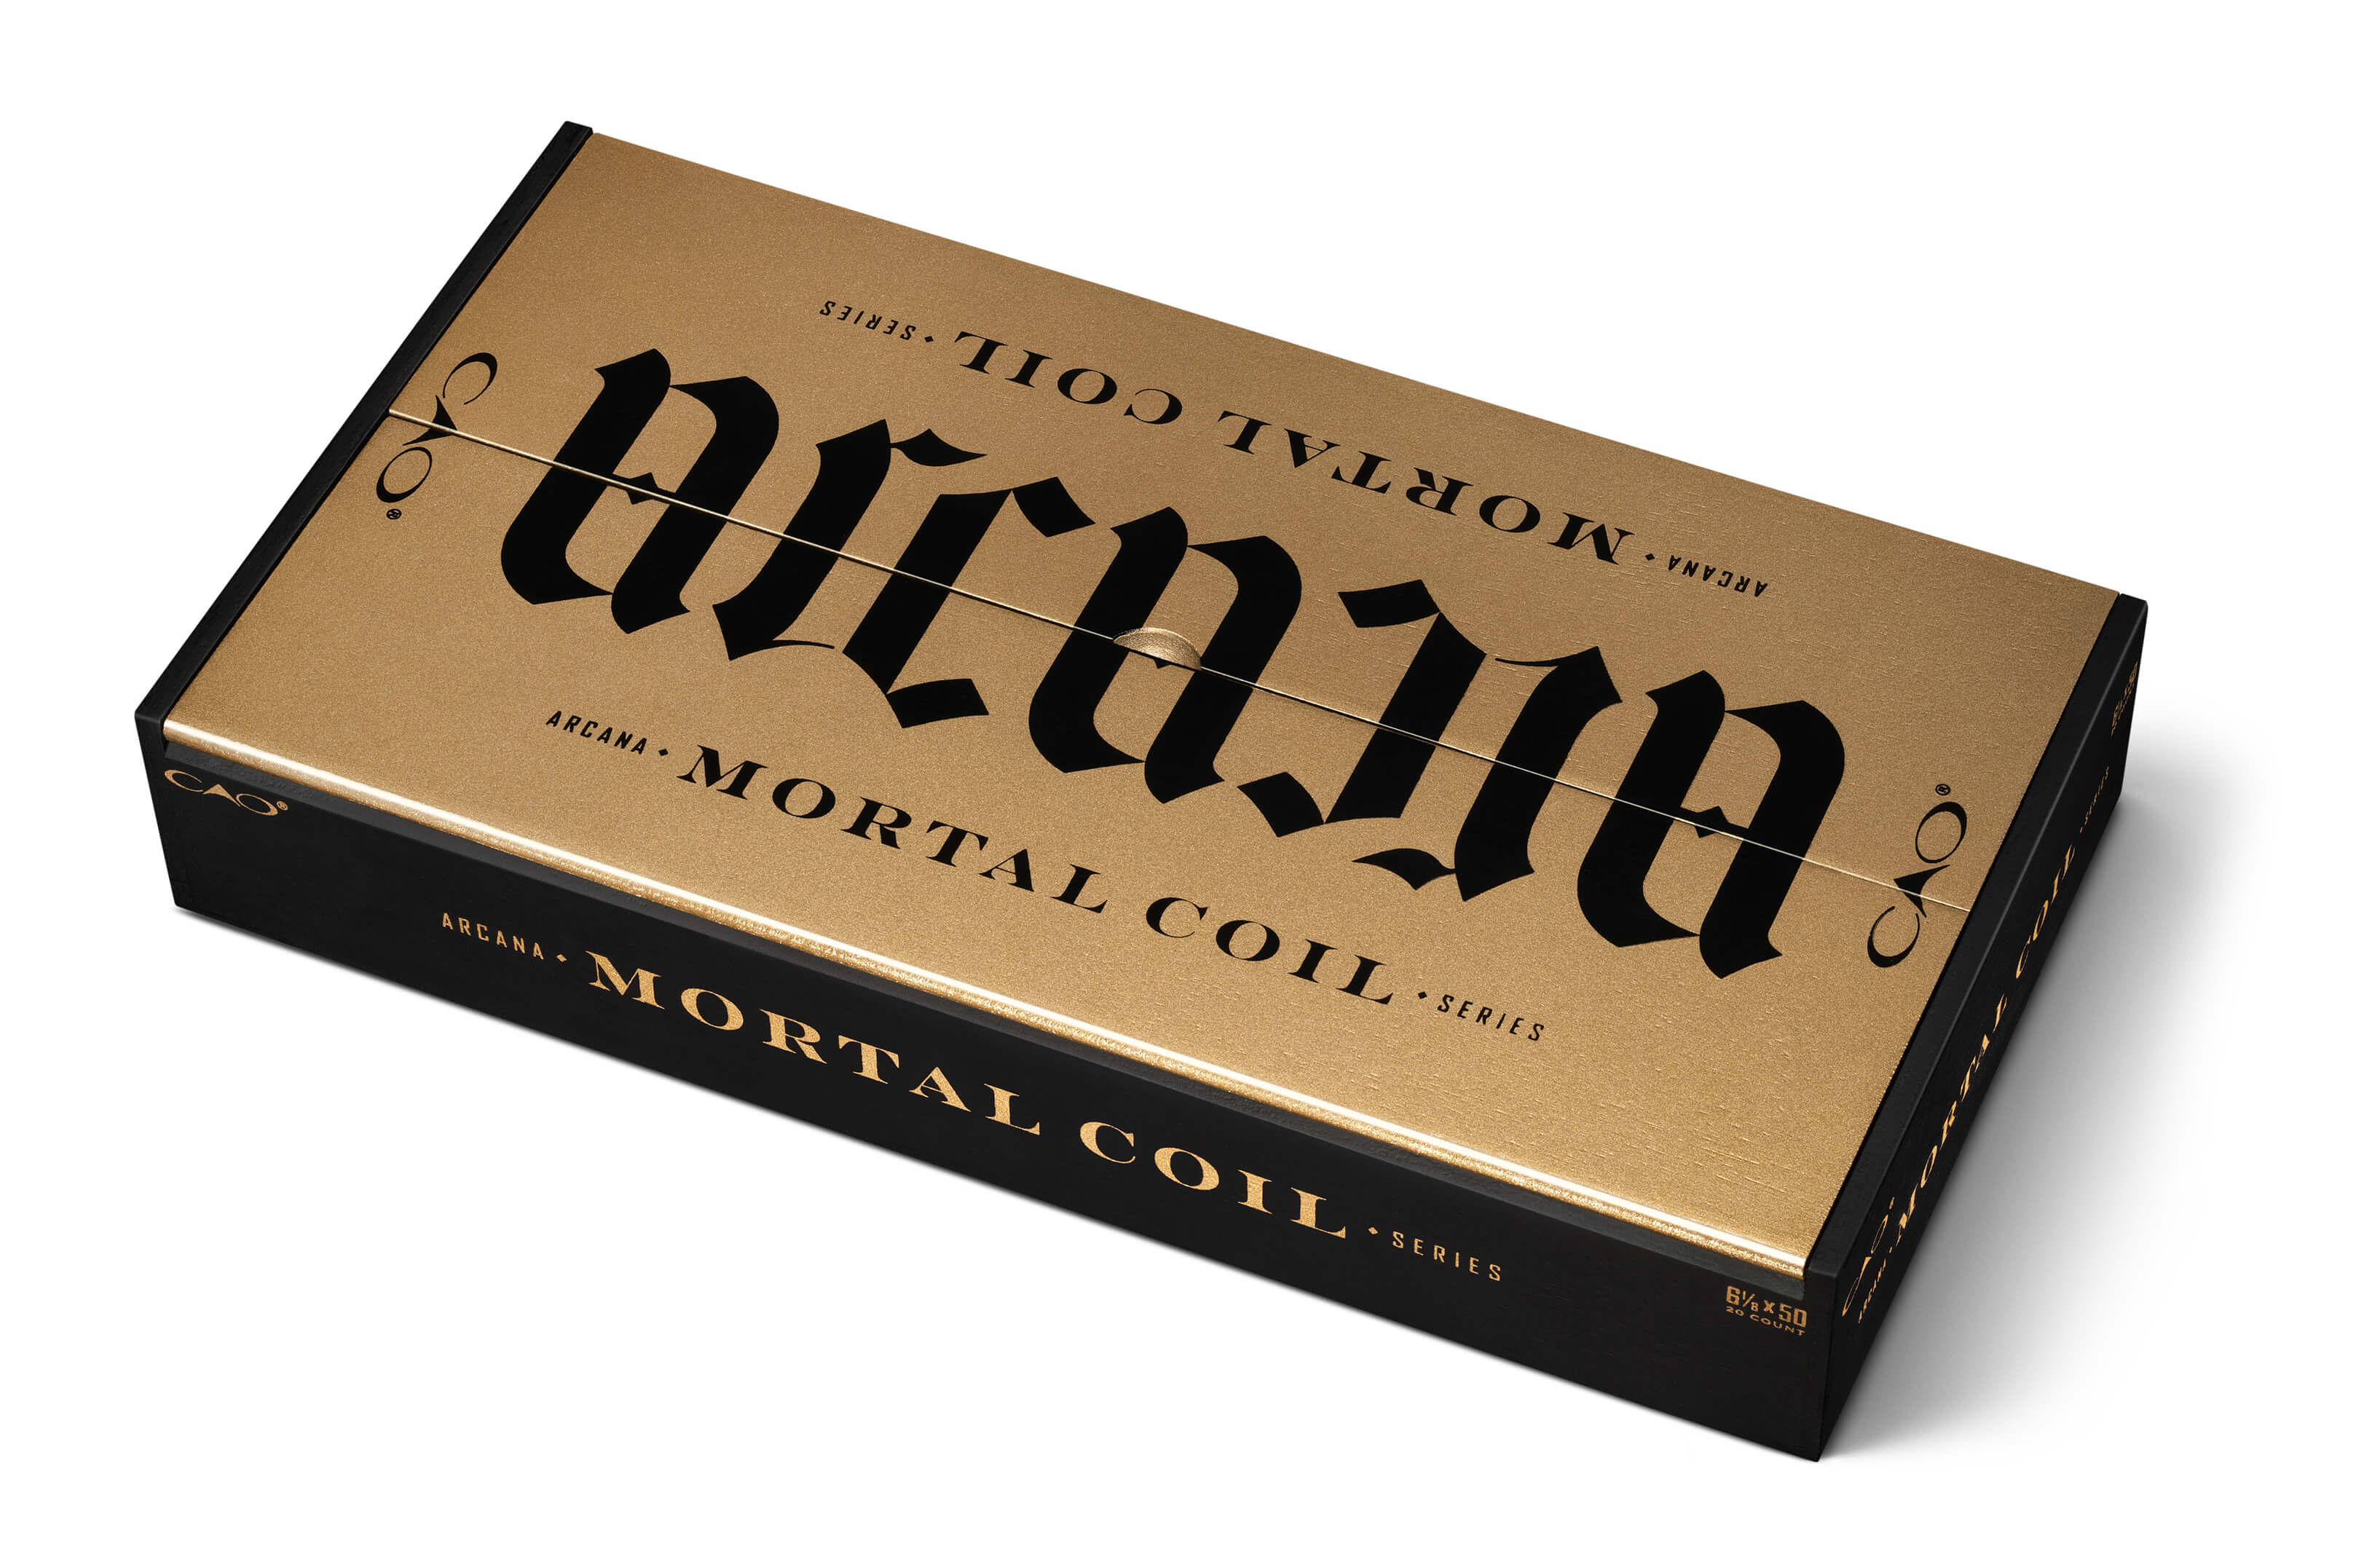 Cigar News: CAO Announces Arcana Series, Starting with Mortal Coil